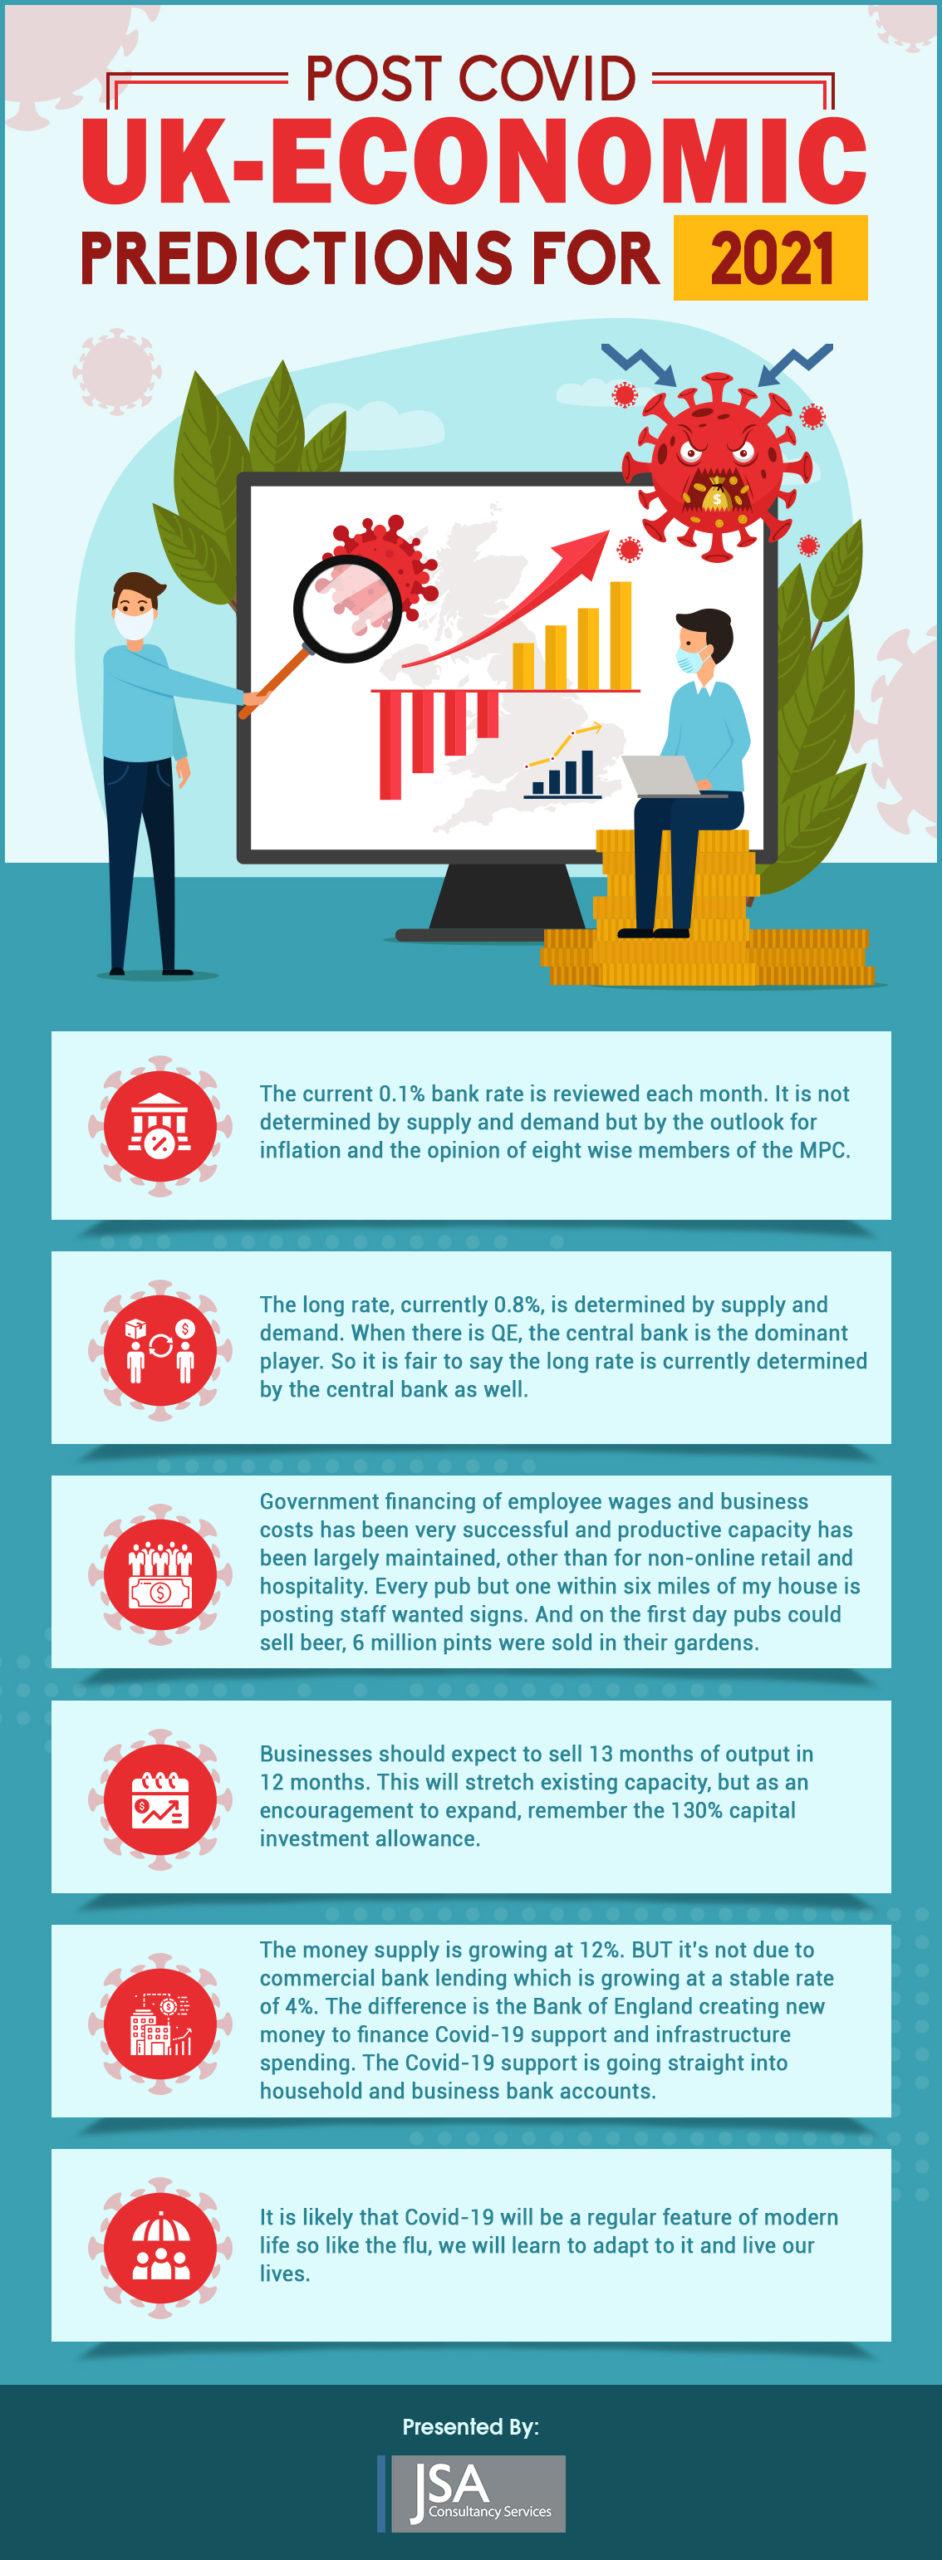 [Infographic] Post COVID UK-Economic Predictions for 2021